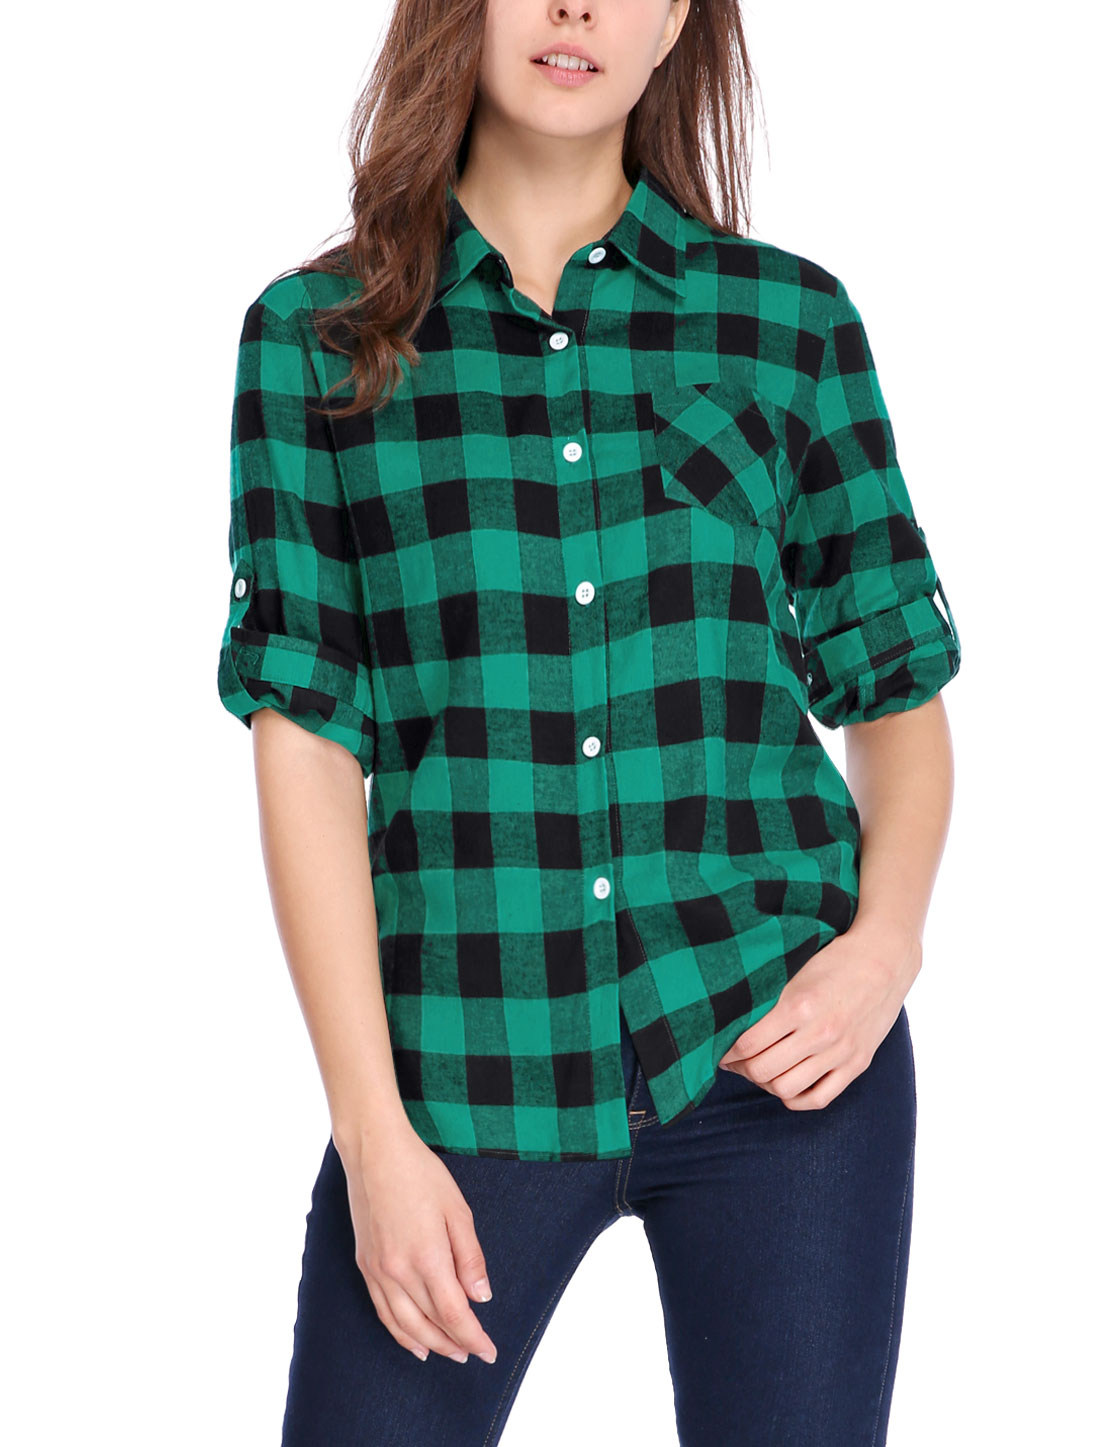 Women Button Up Long Sleeve Point Collar Plaid Pattern Shirts Green Black M